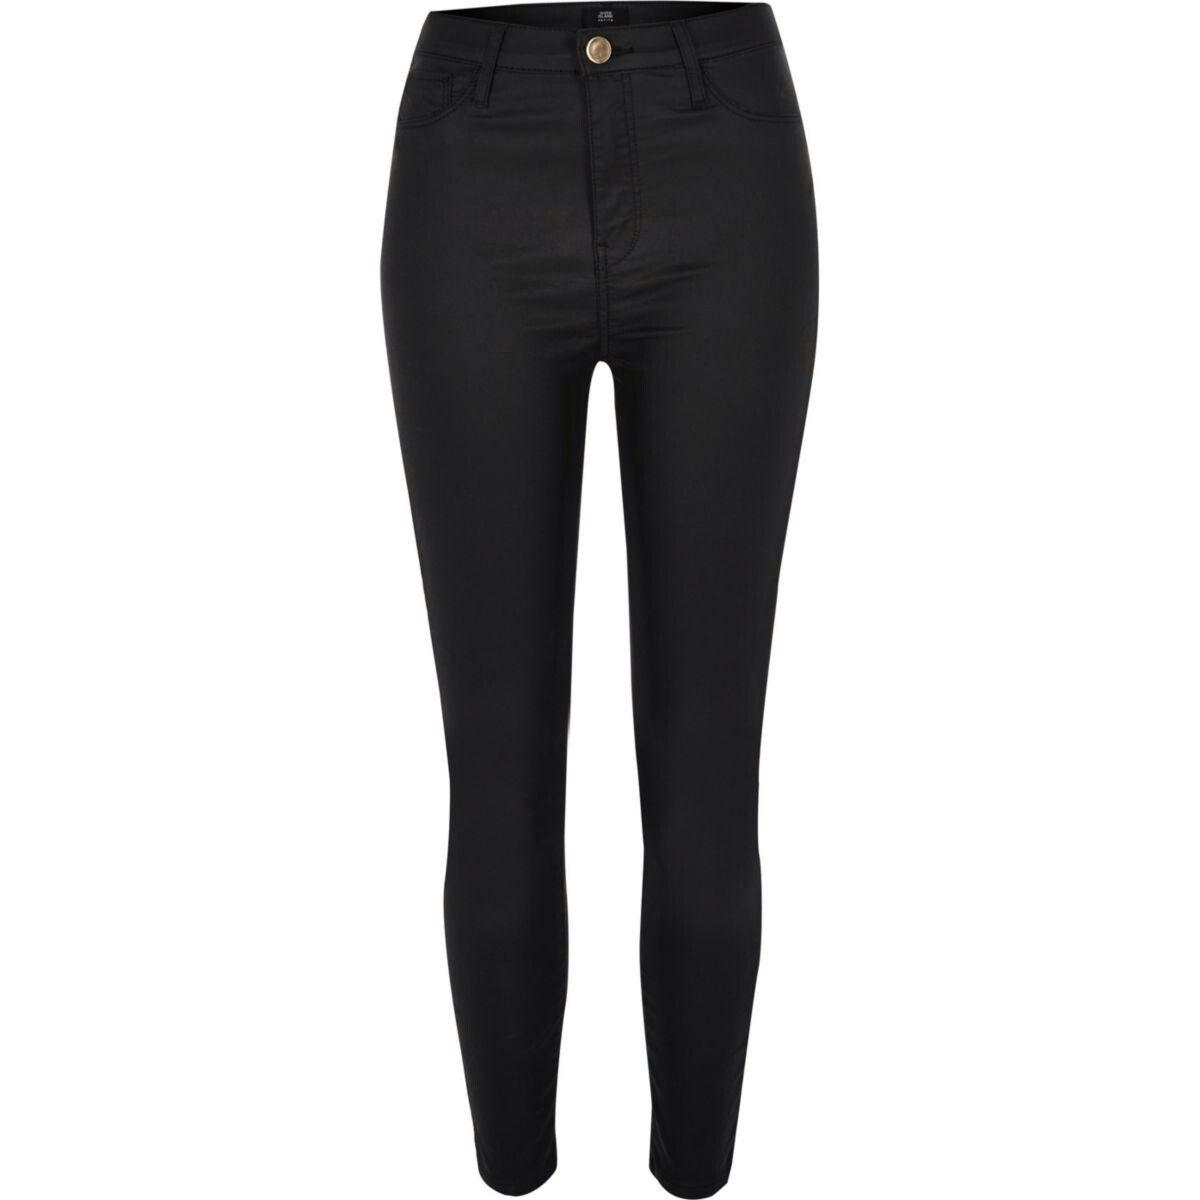 c1562f501cb38 Petite black Harper super skinny coated jeans | Leather pants ...